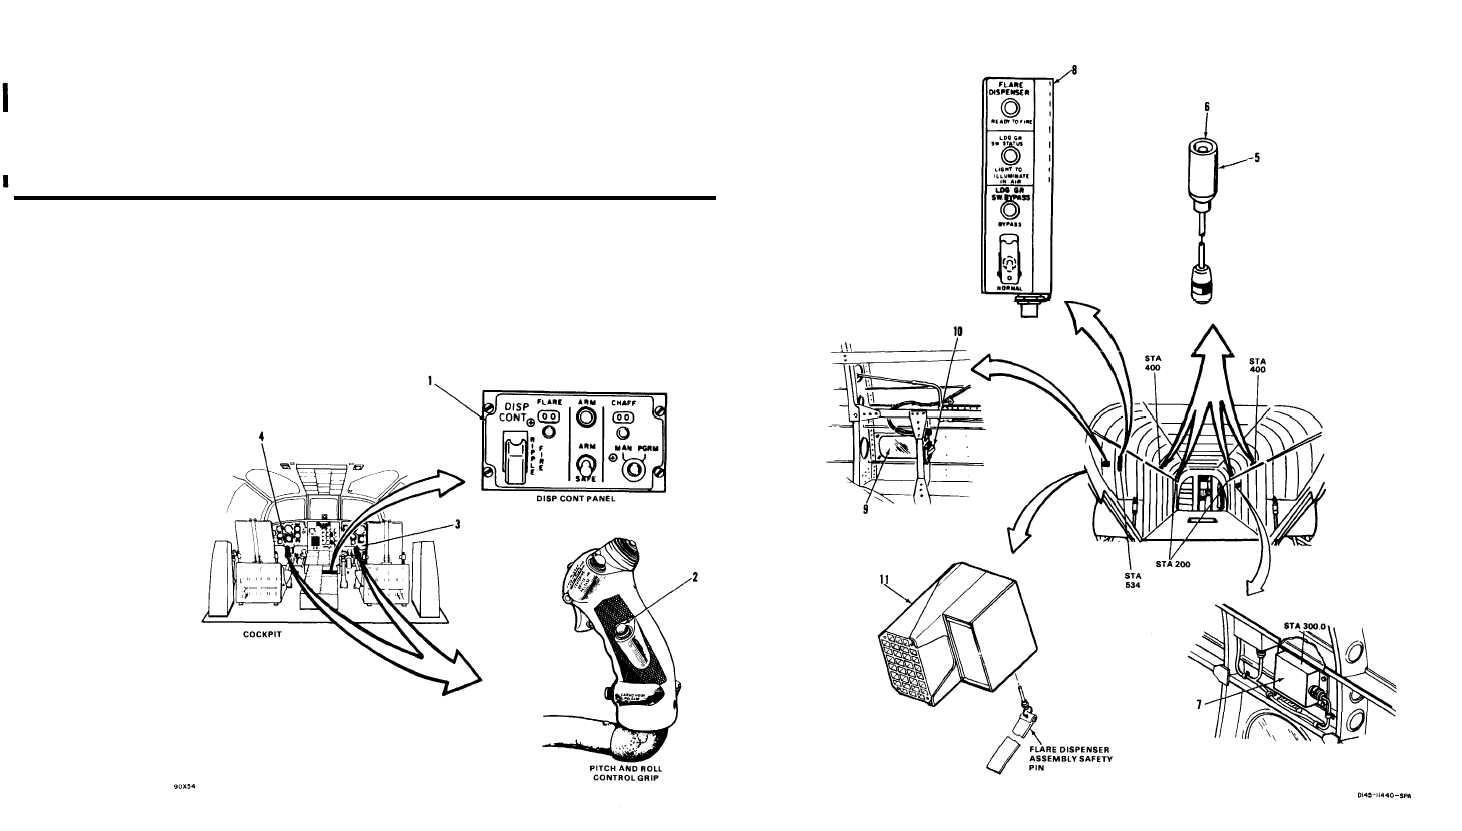 Flare Dispenser System Visual Check